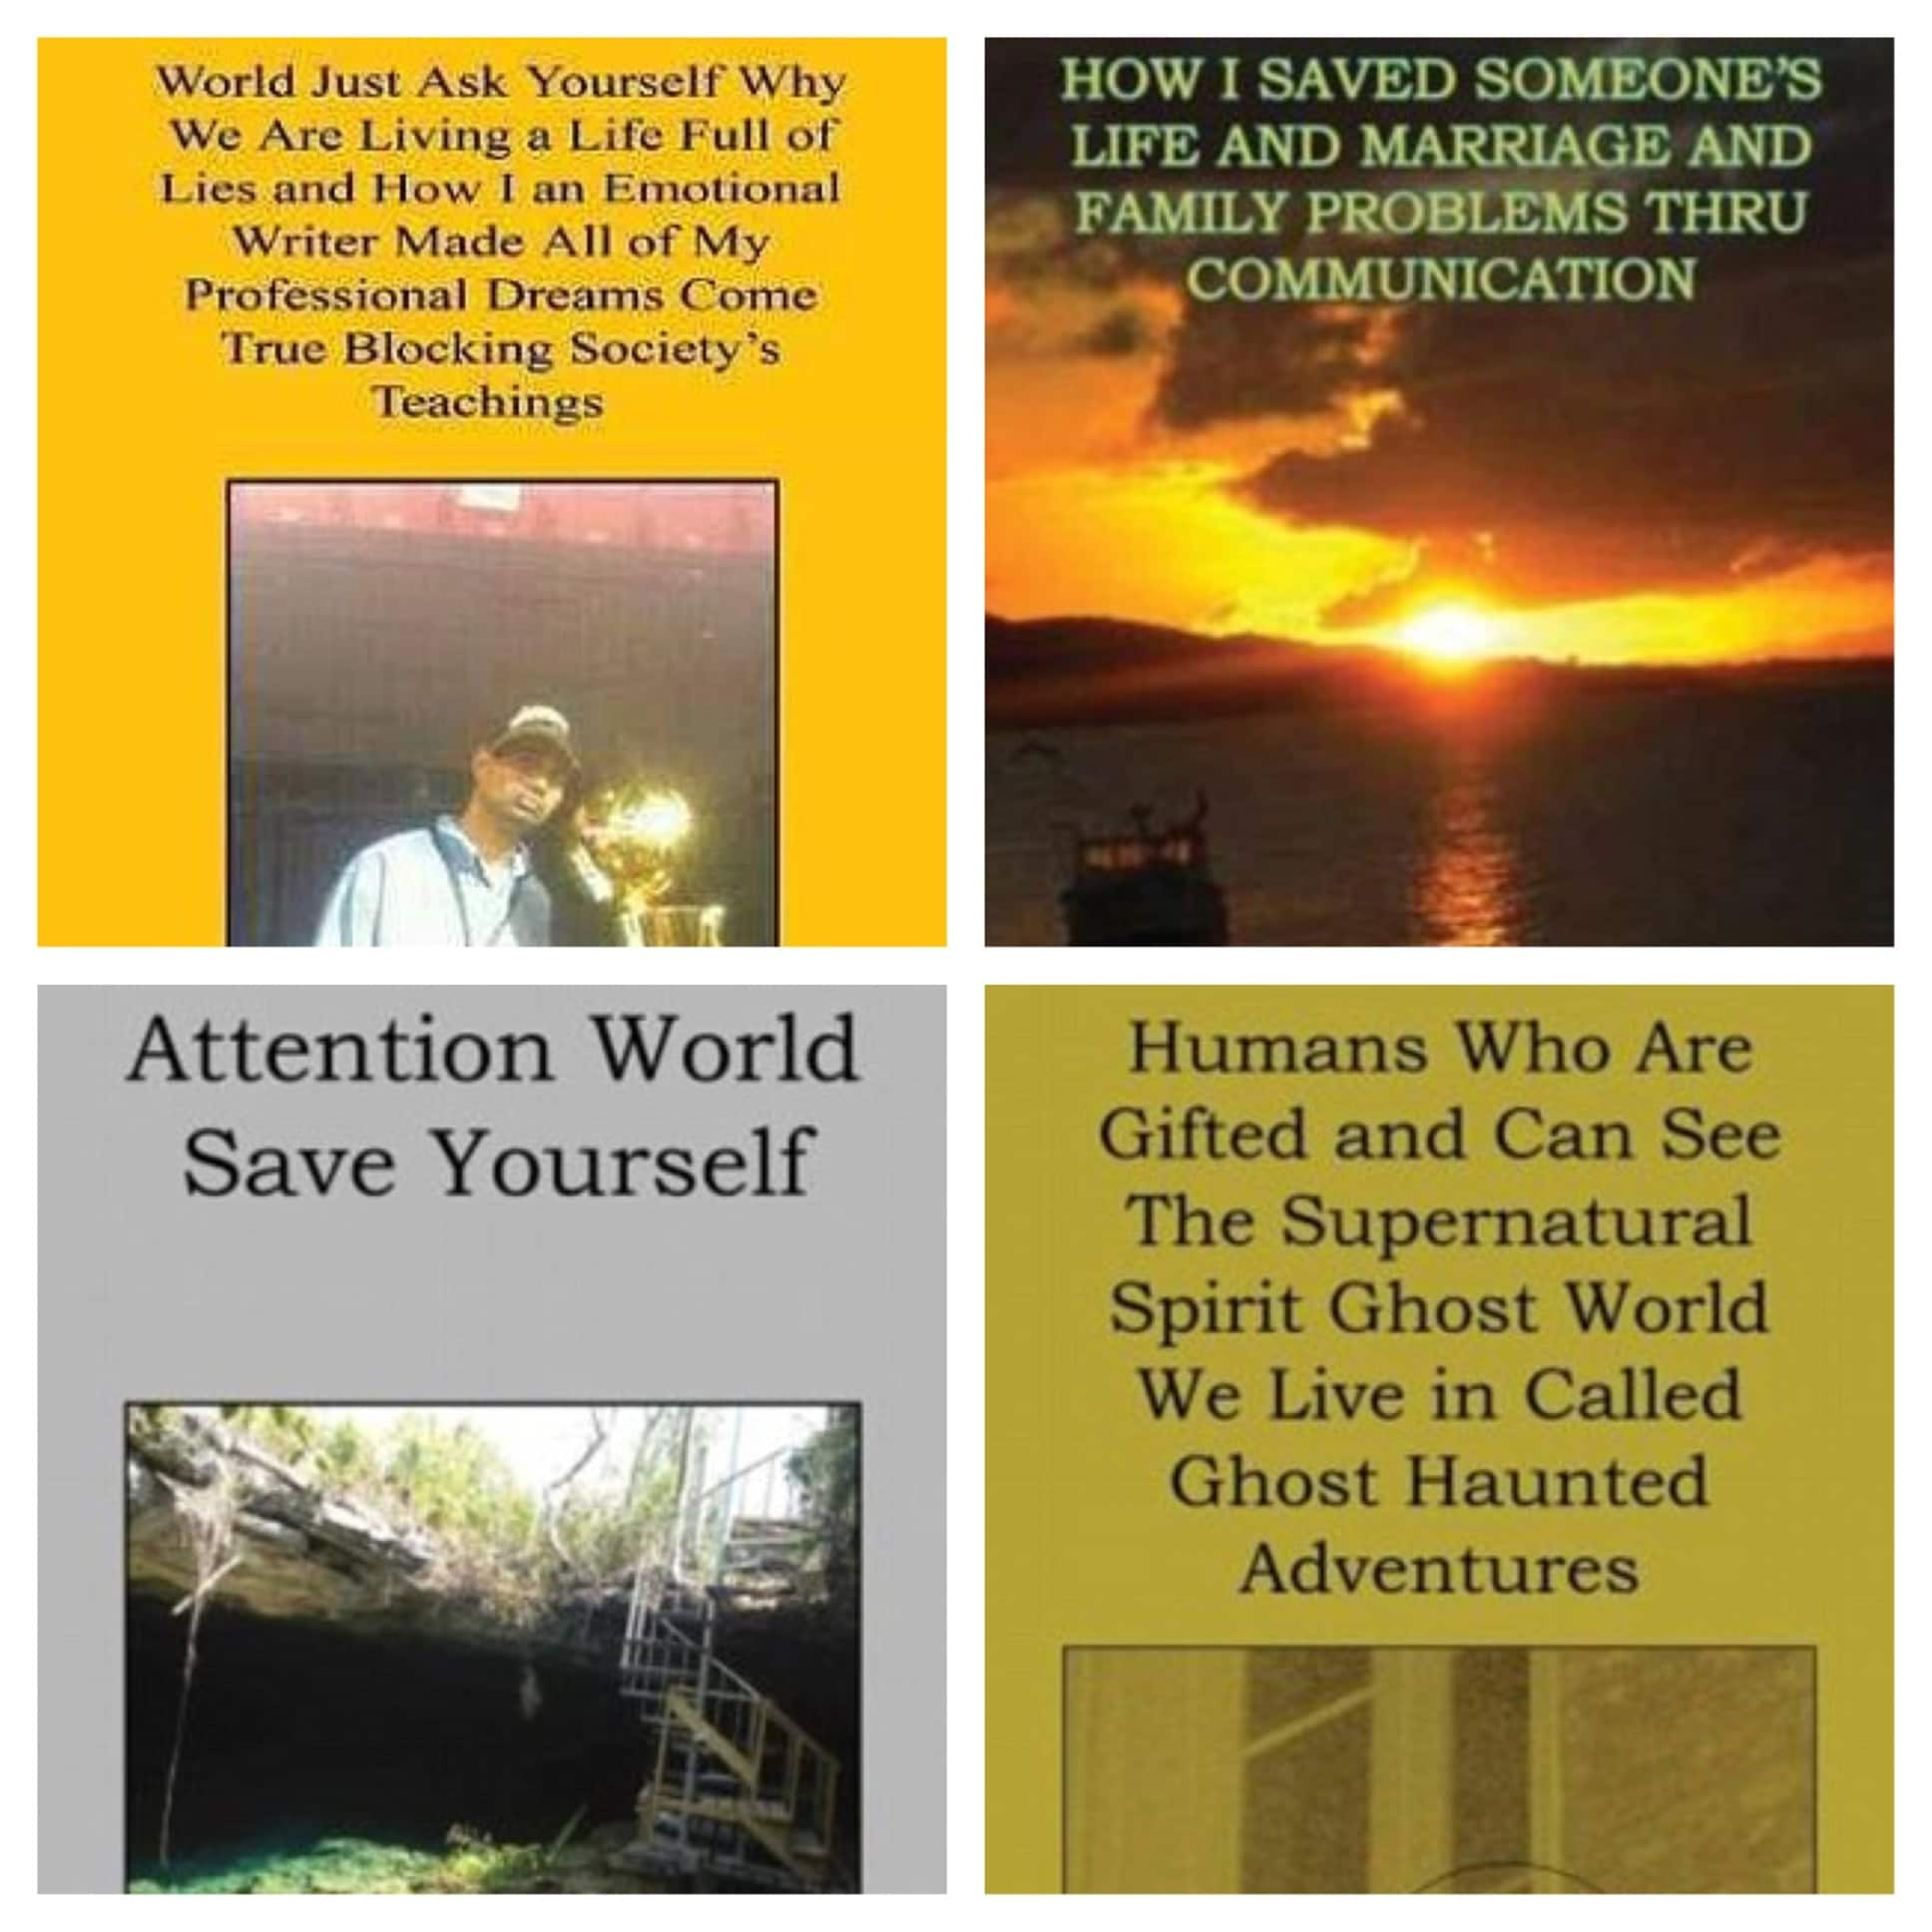 Medina's oddly titled self-help e-books